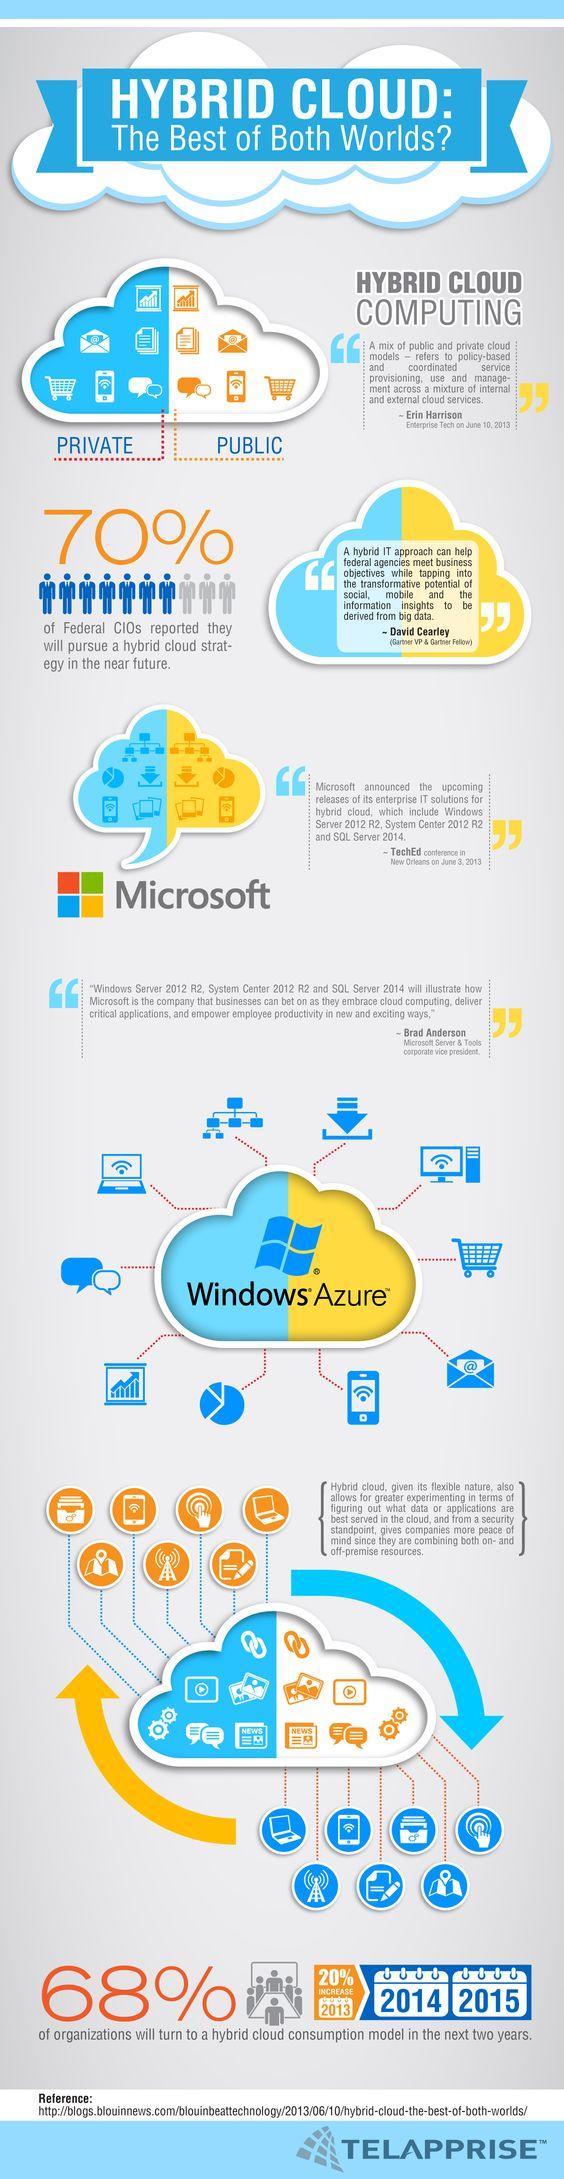 Cloud Backup Skybird Technology Hybrid Cloud Cloud Computing Services Cloud Computing